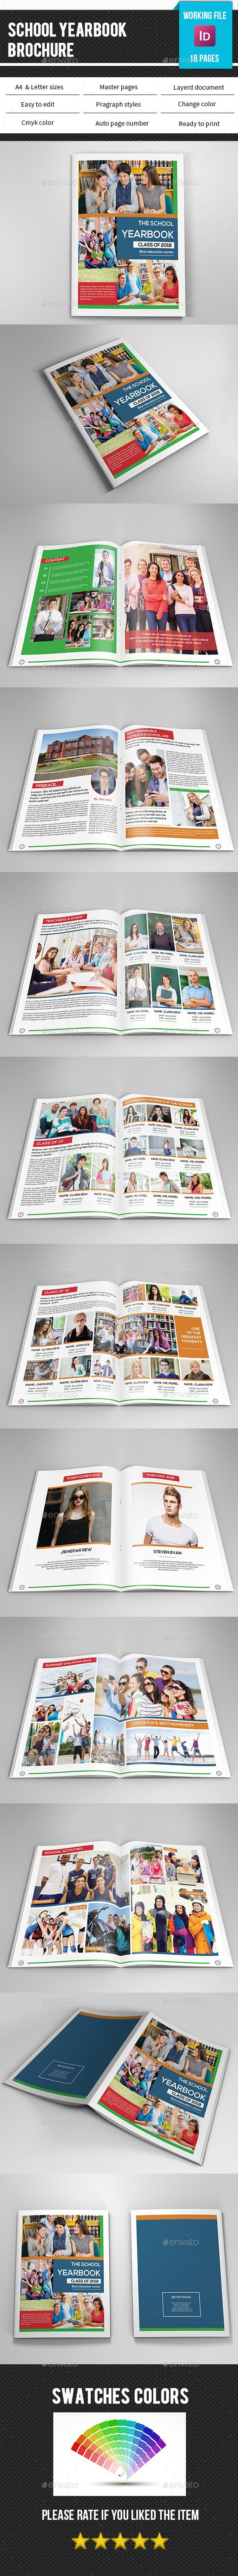 School Yearbook Template-V337 | Pinterest